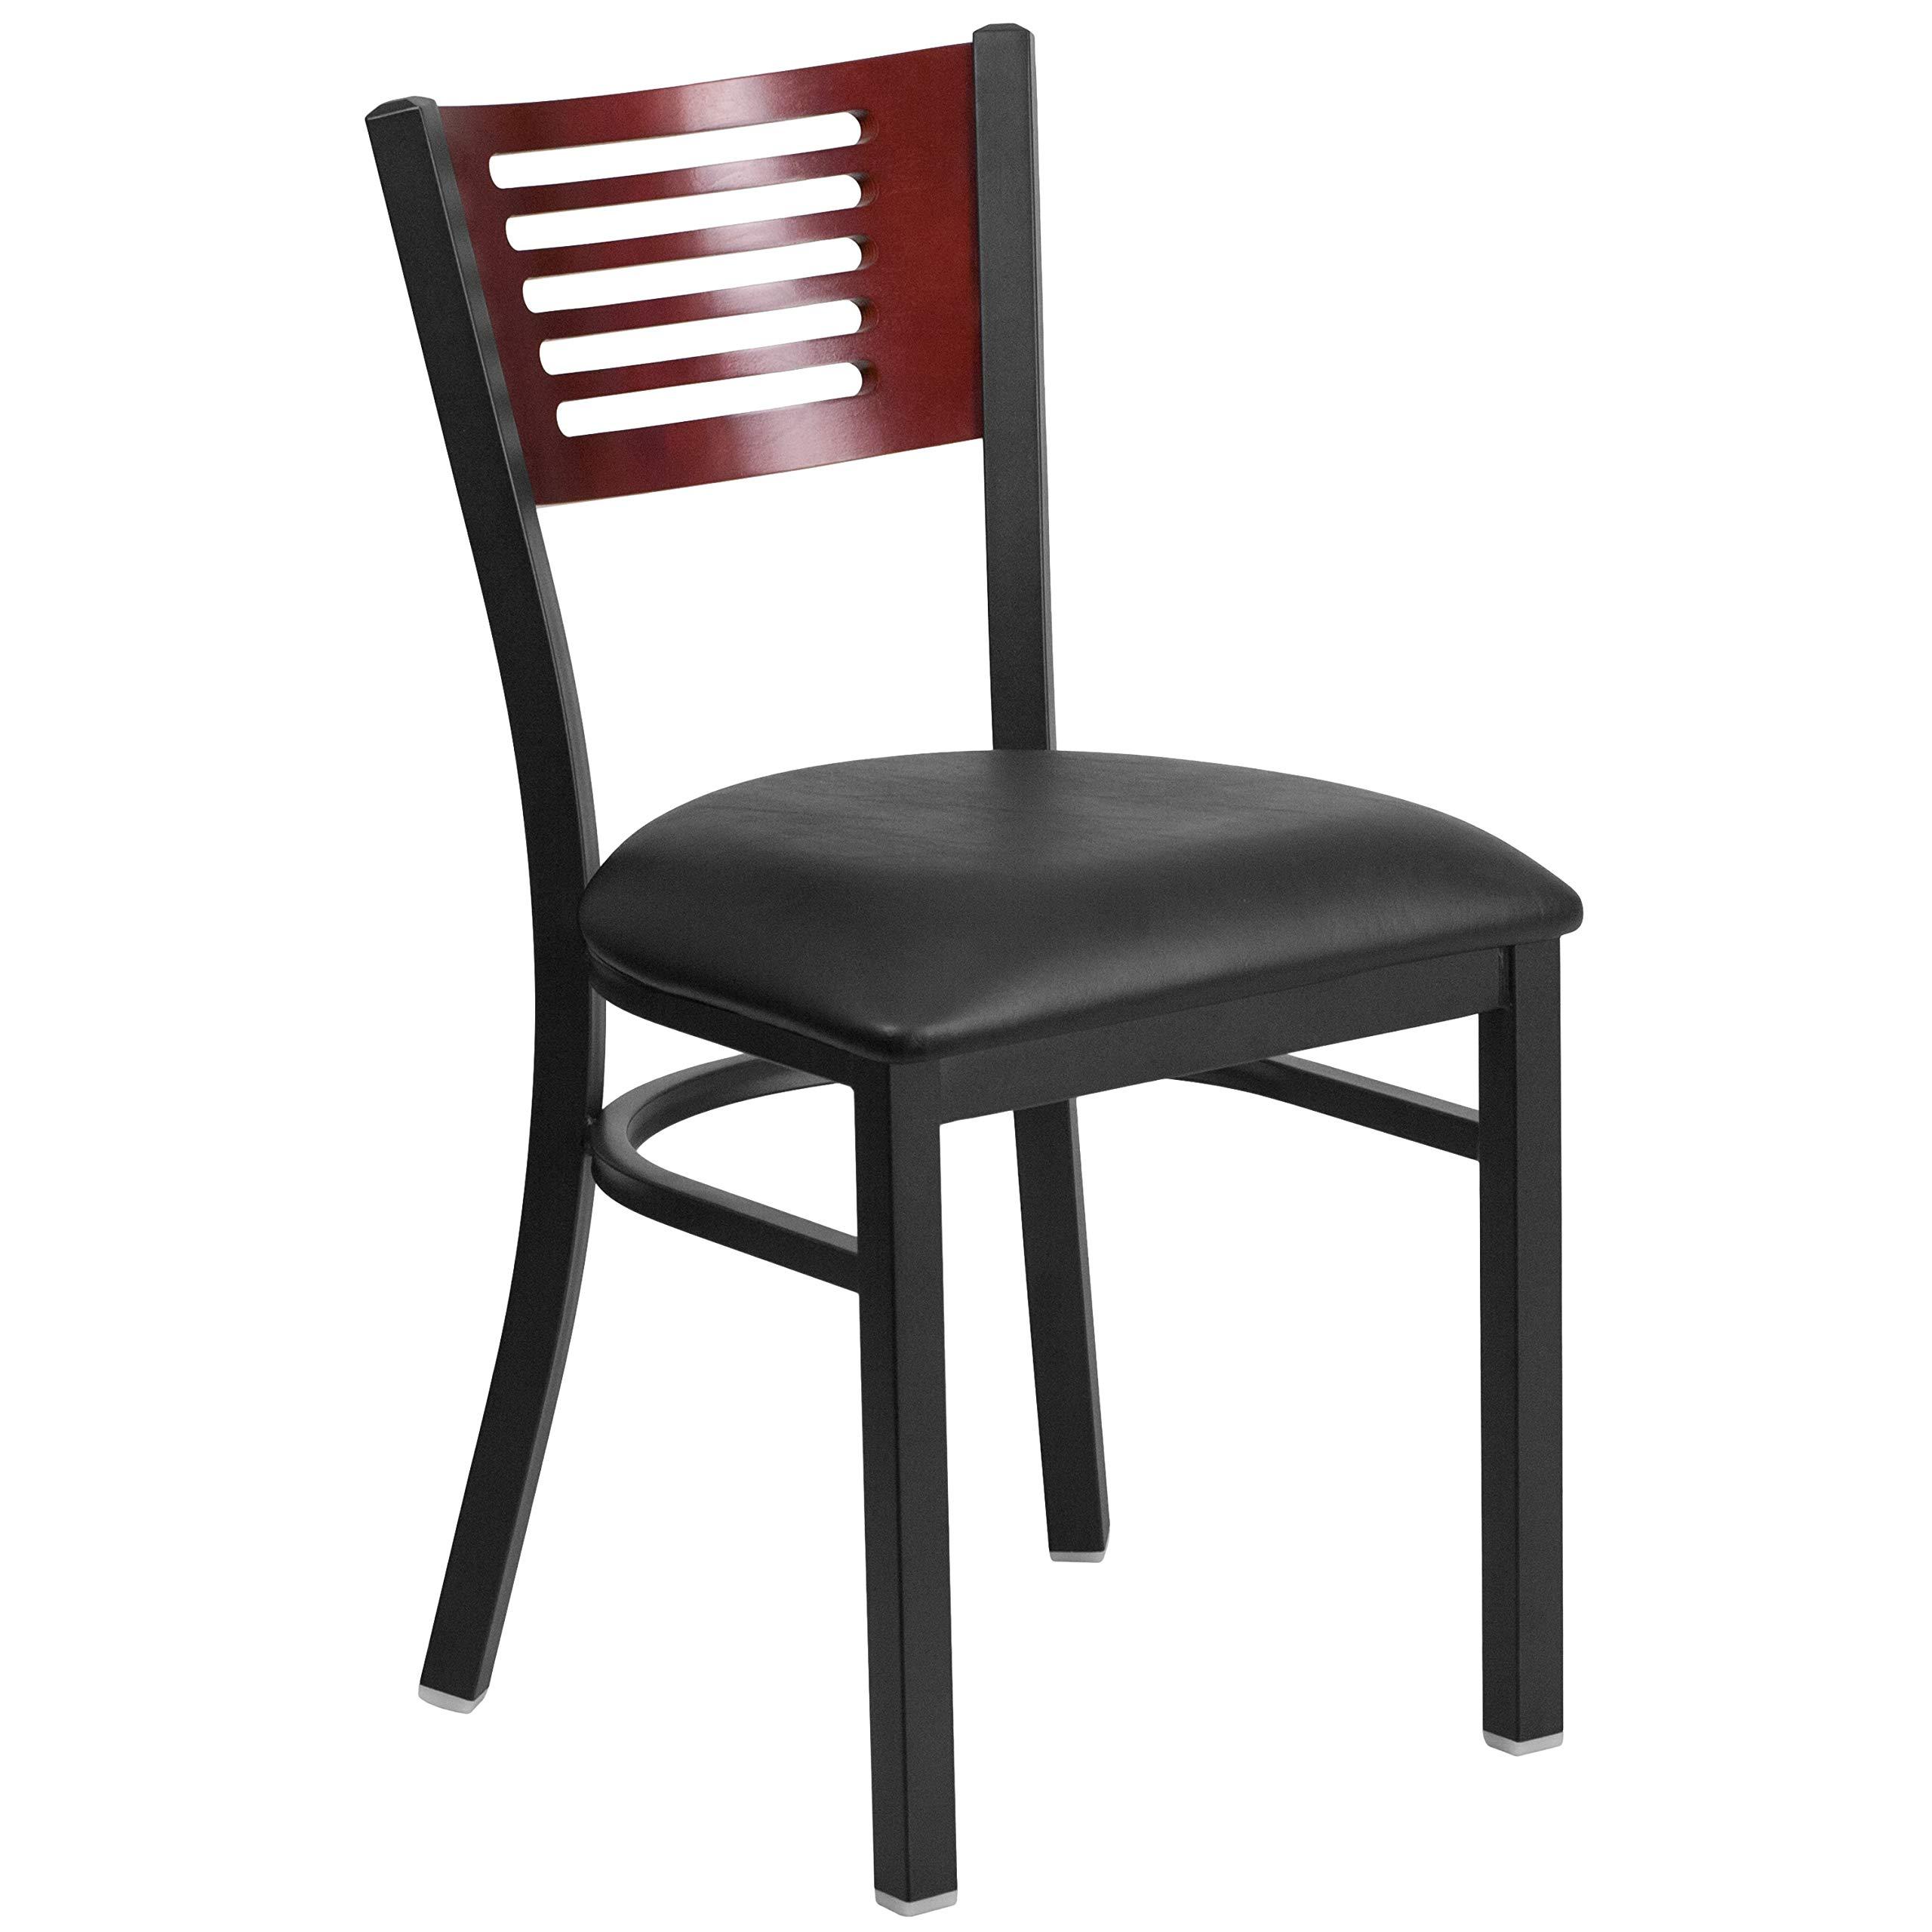 MFO Princeton Black Slat Back Metal Restaurant Chair - Mahogany Wood Back, Black Vinyl Seat